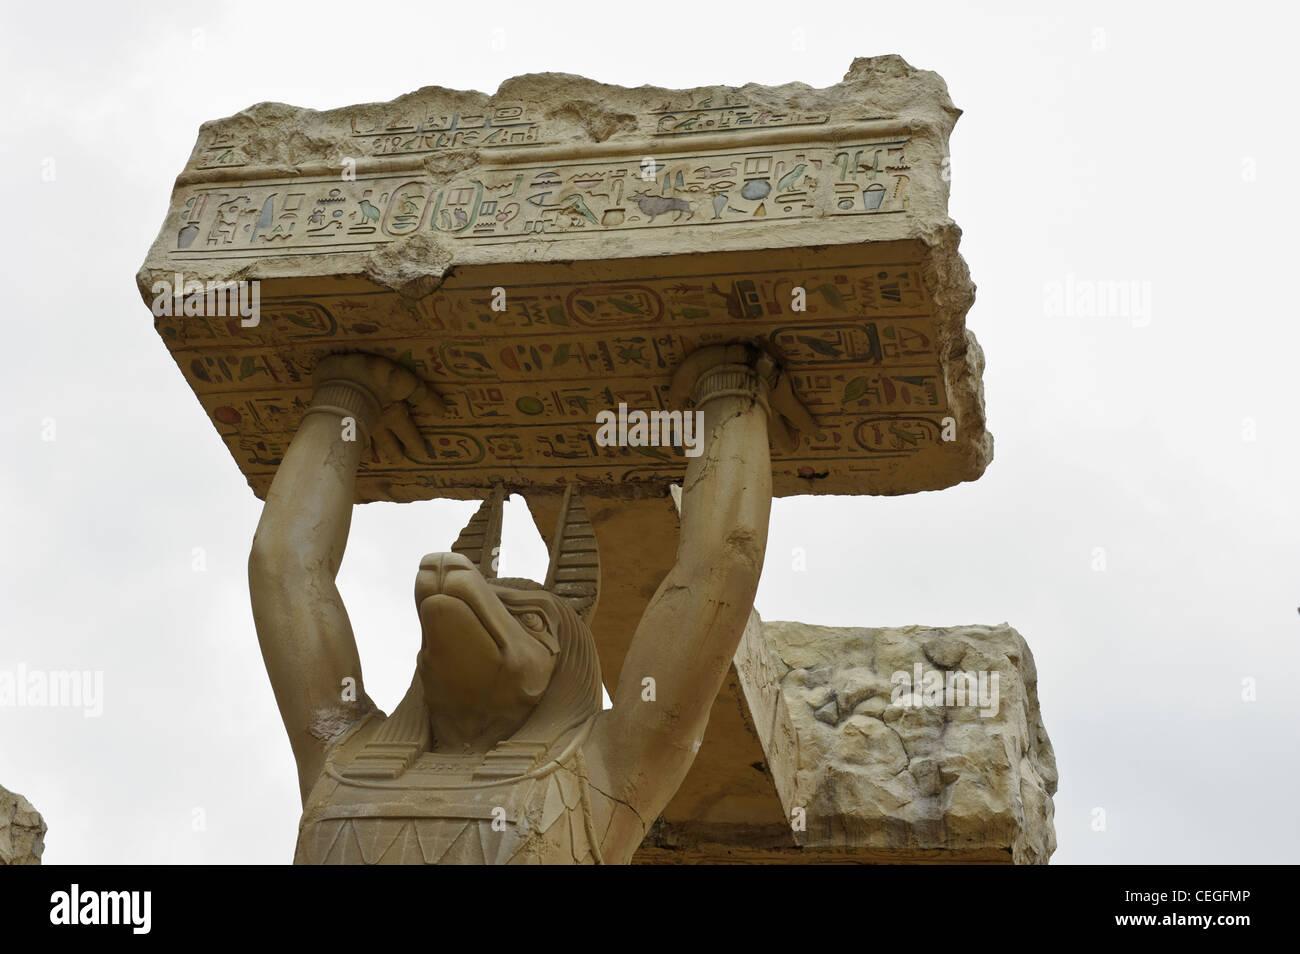 Giant Anubis Statues, Ancient Egypt, Universal Studios